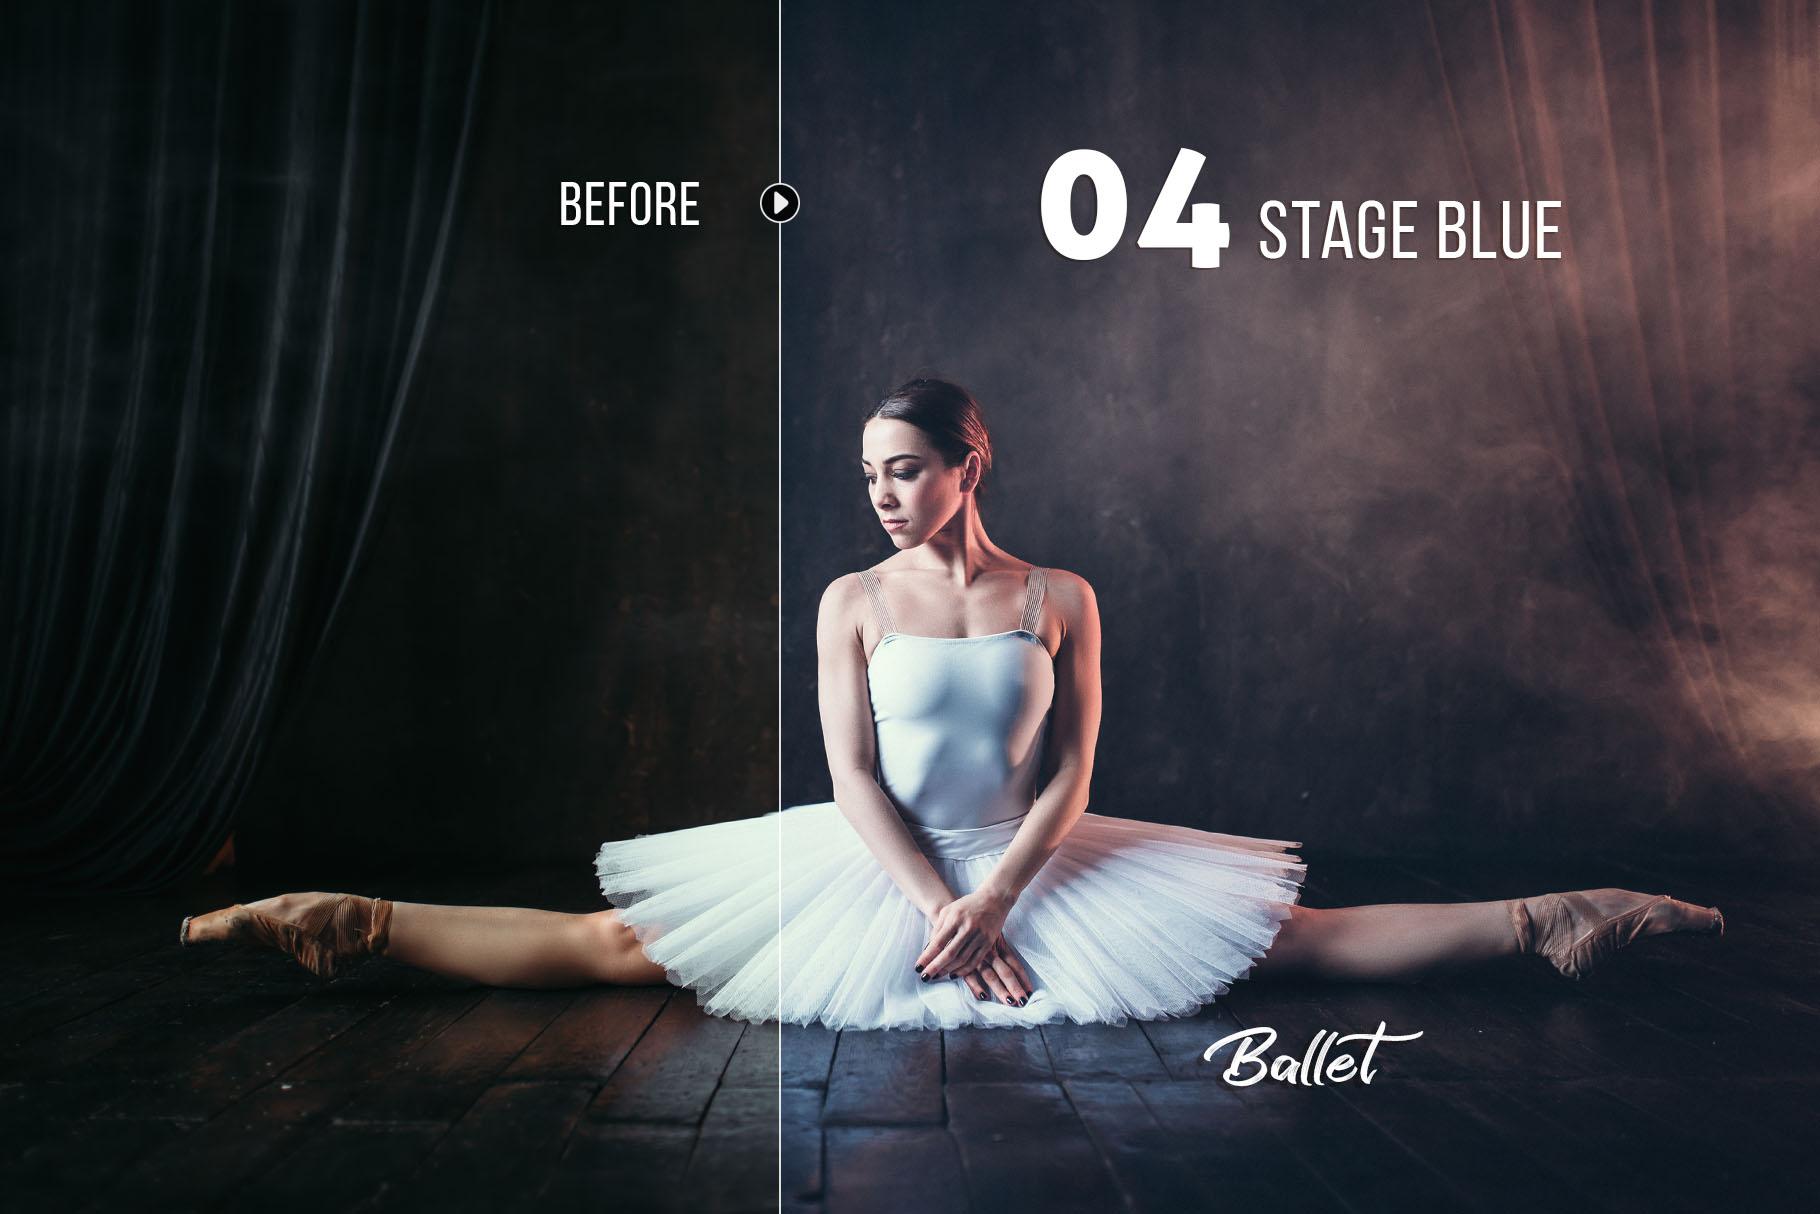 ballet_preview_04